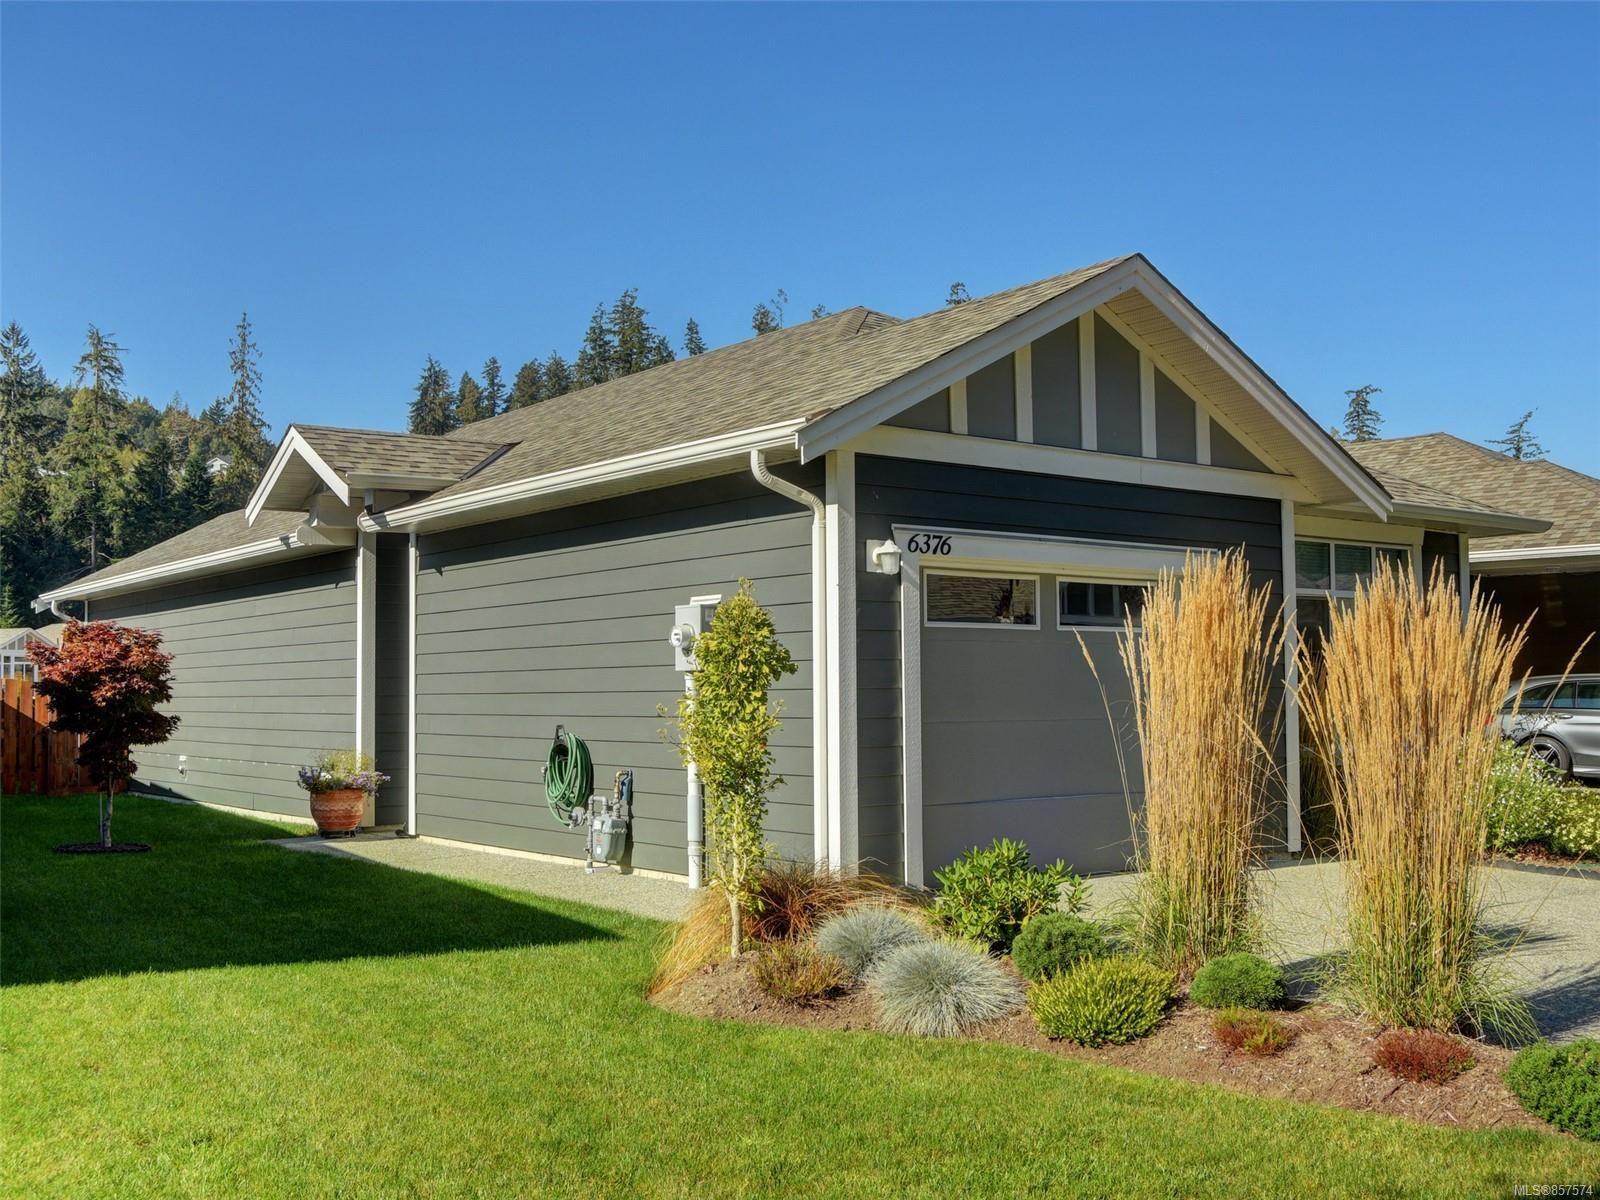 Photo 22: Photos: 6376 Shambrook Dr in : Sk Sunriver House for sale (Sooke)  : MLS®# 857574